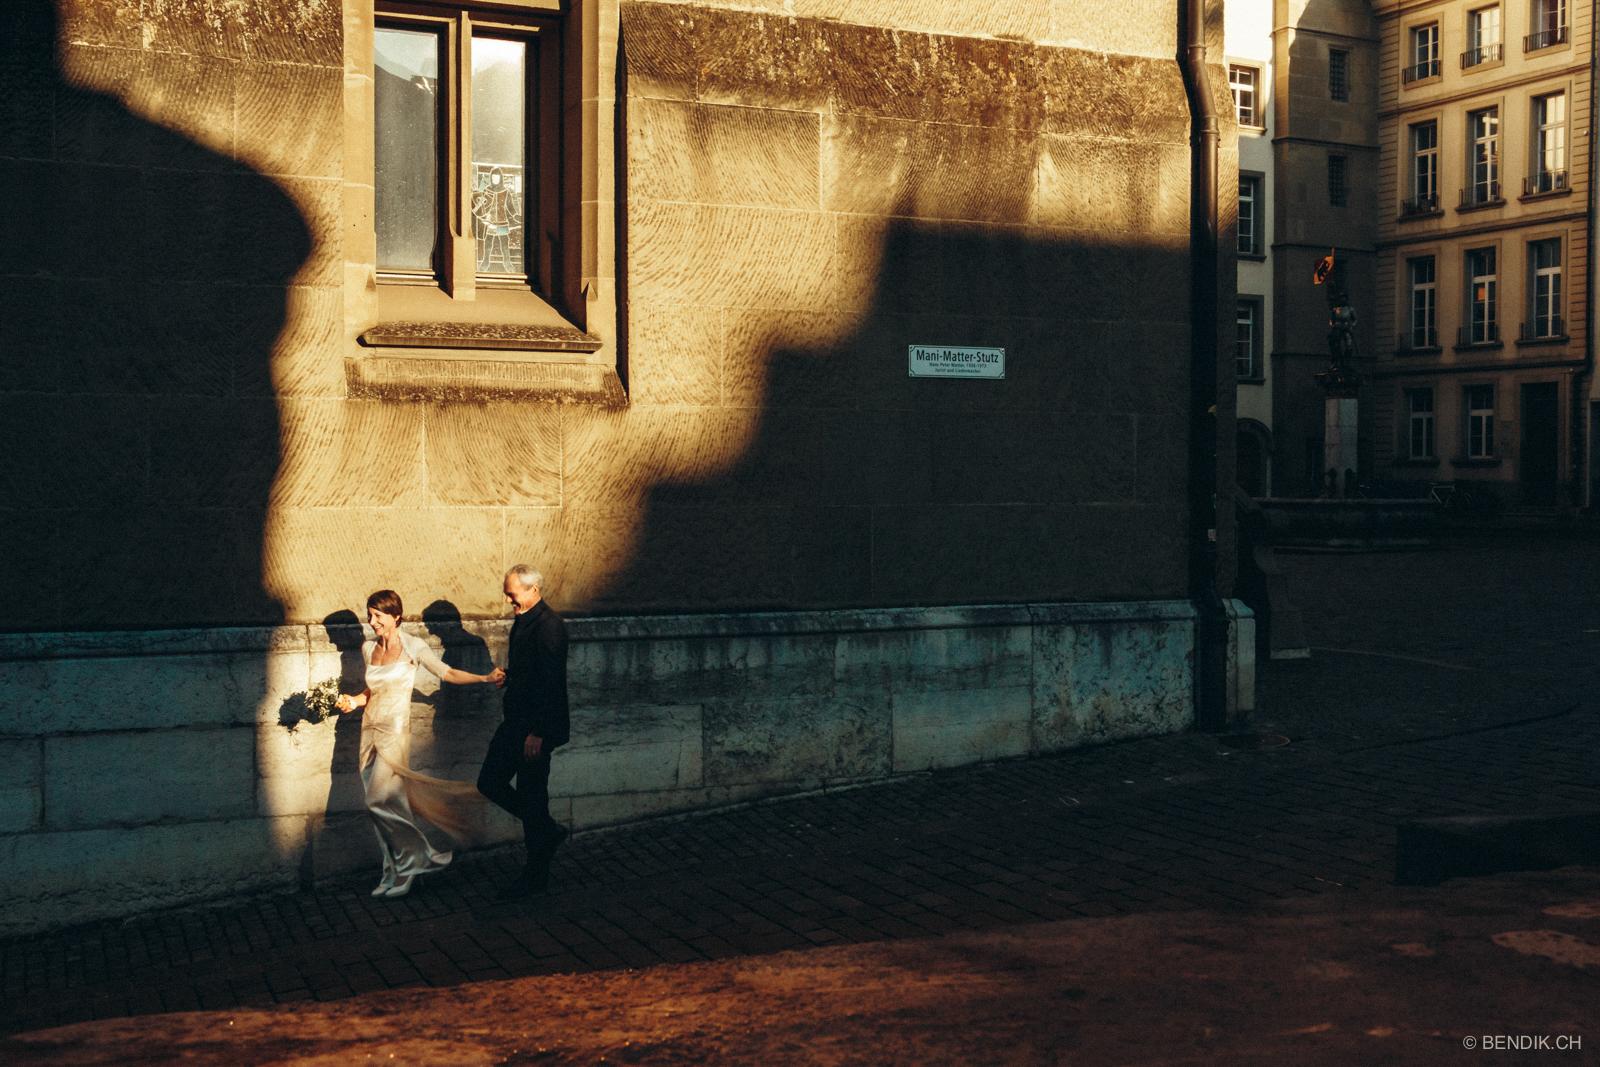 Brautpaar läuft lachend einen Weg in Bern entlang